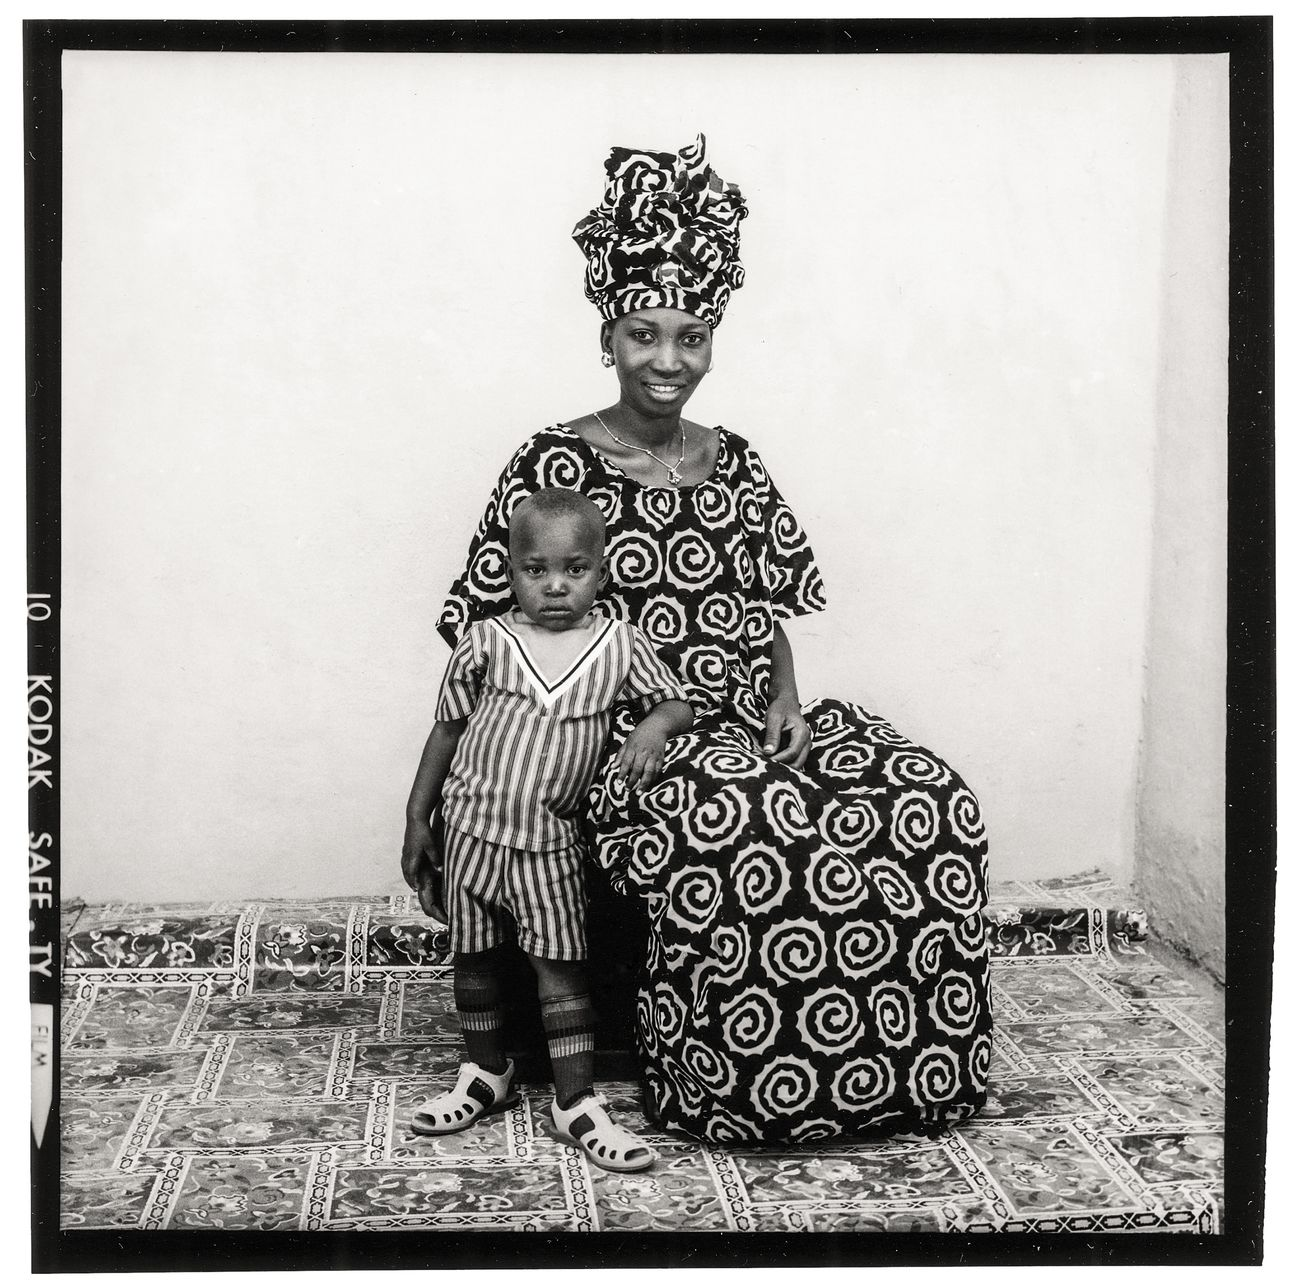 Malick Sidibé, Senza titolo, 1973. Courtesy succession Malick Sidibé © Malick Sidibé